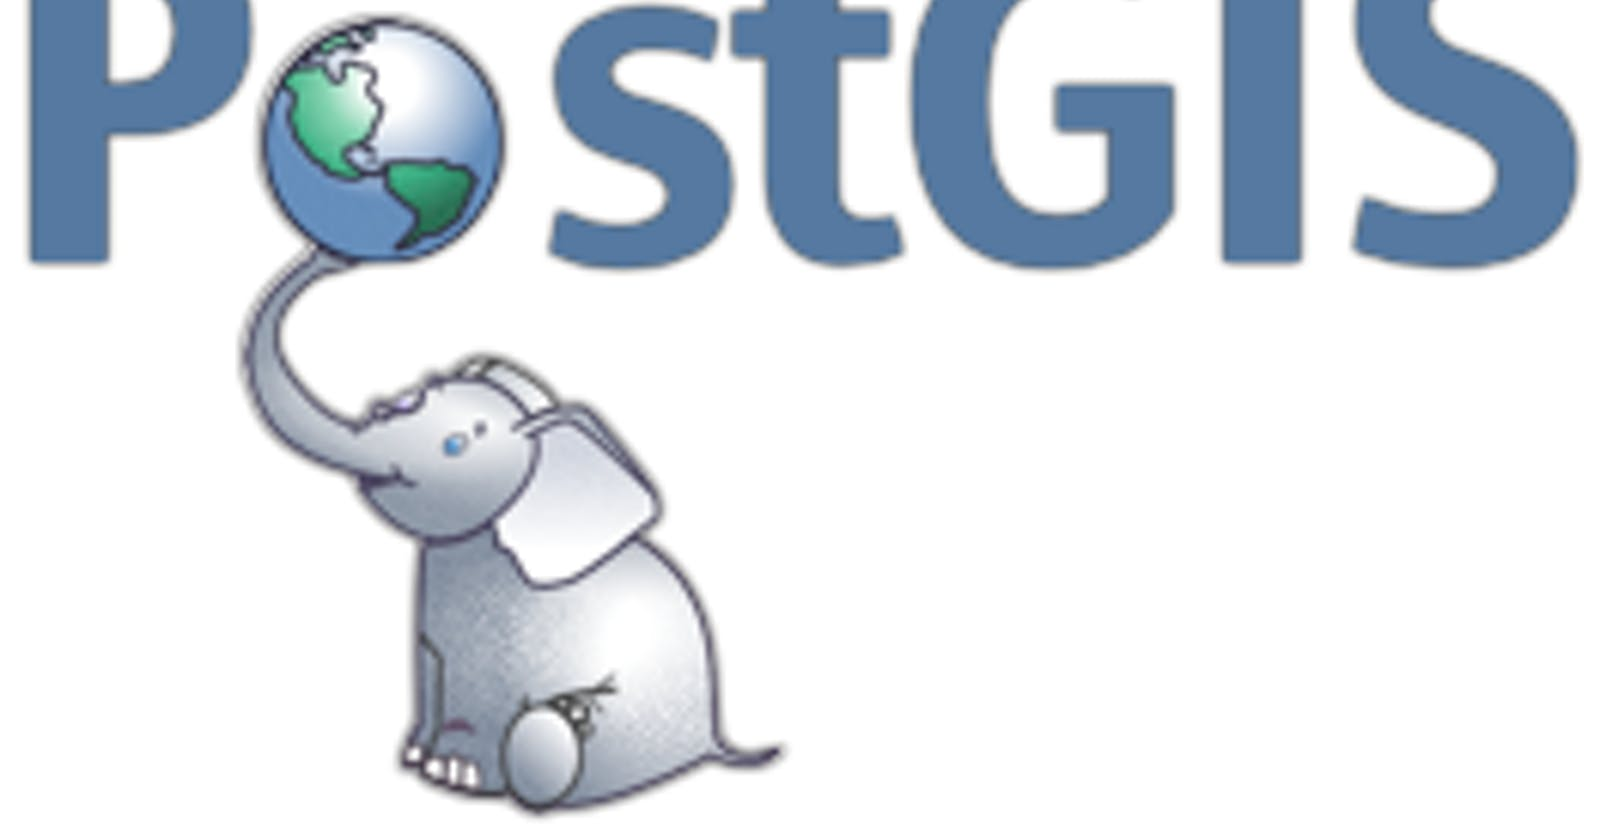 Use spatial functions in PostGIS